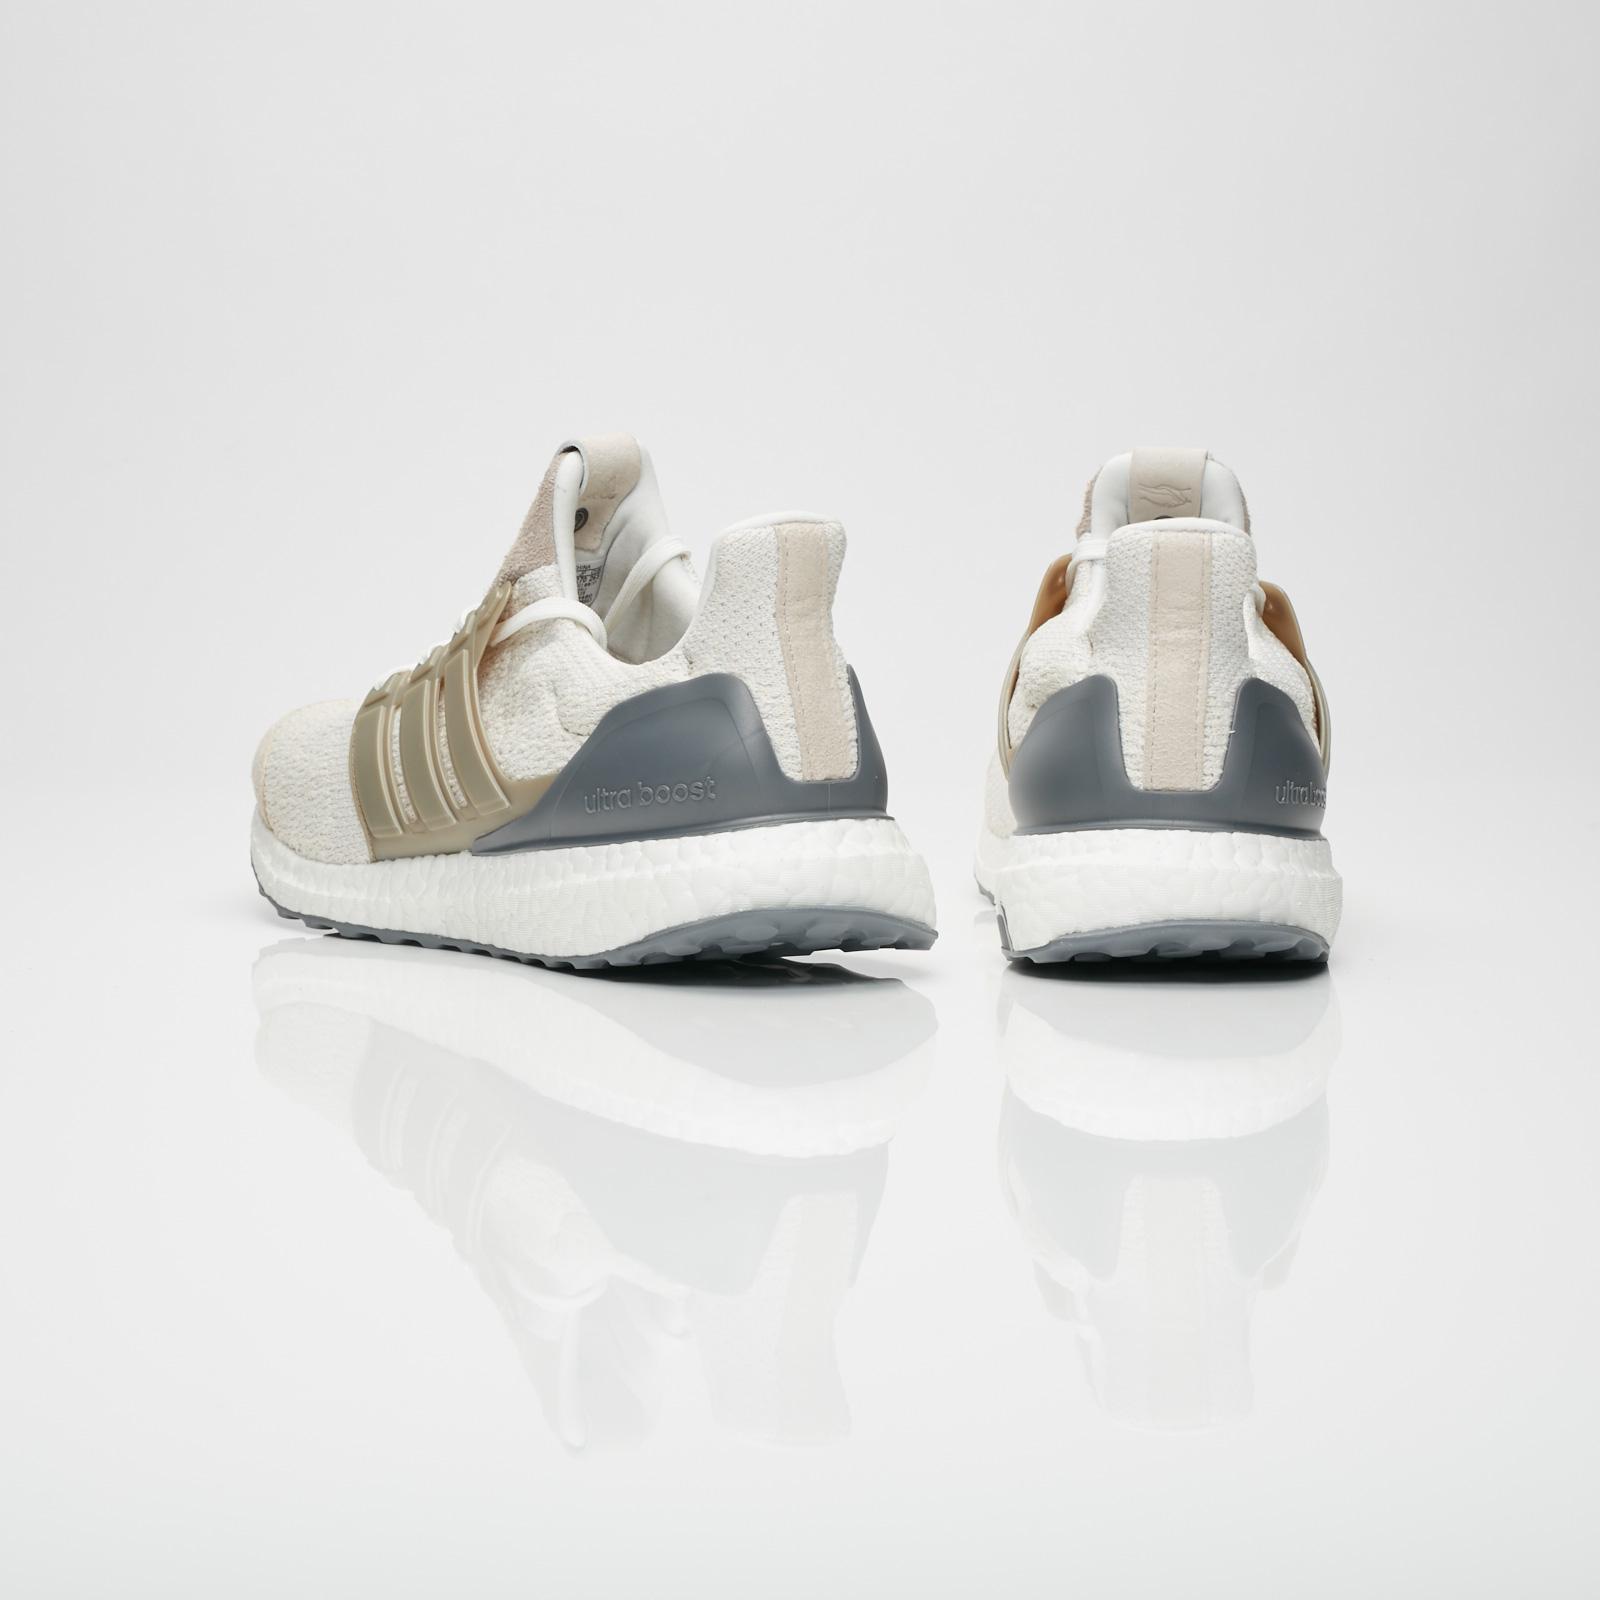 sneakersnstuff social status adidas consortium ultra boost lux 1